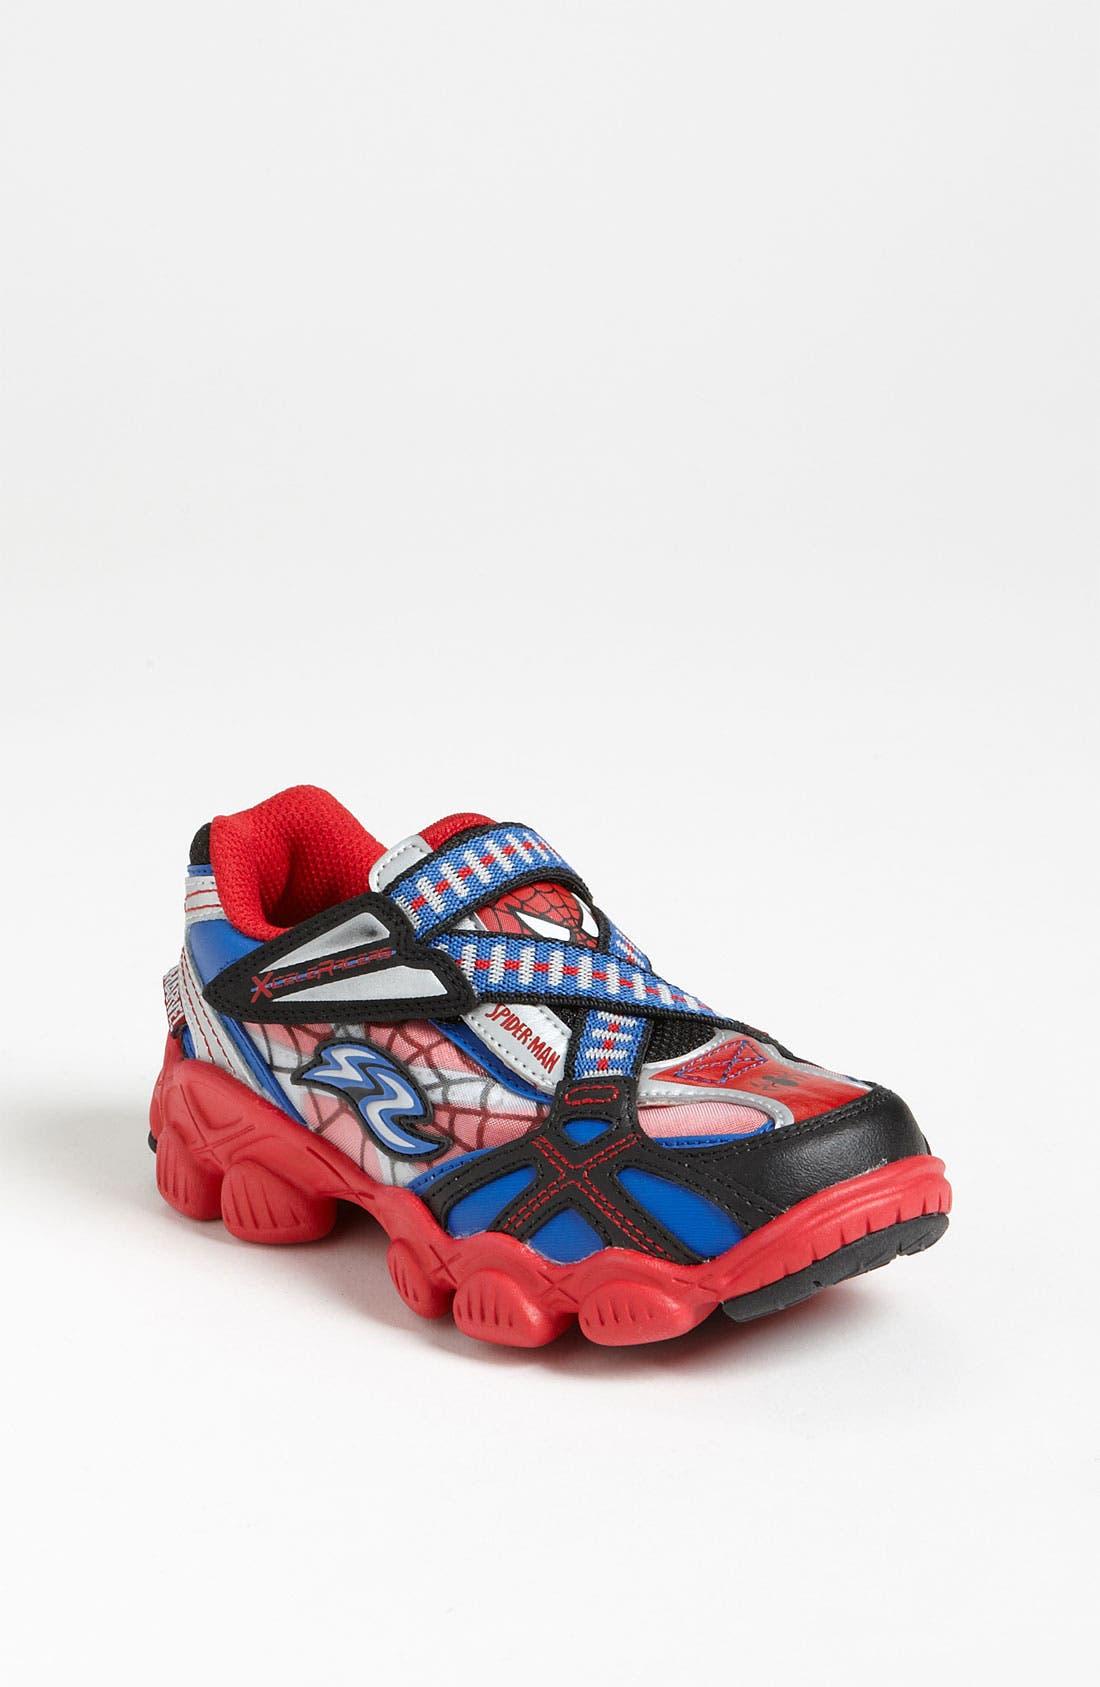 Alternate Image 1 Selected - Stride Rite 'X-Celeracers Spider-Man®' Sneaker (Toddler & Little Kid)